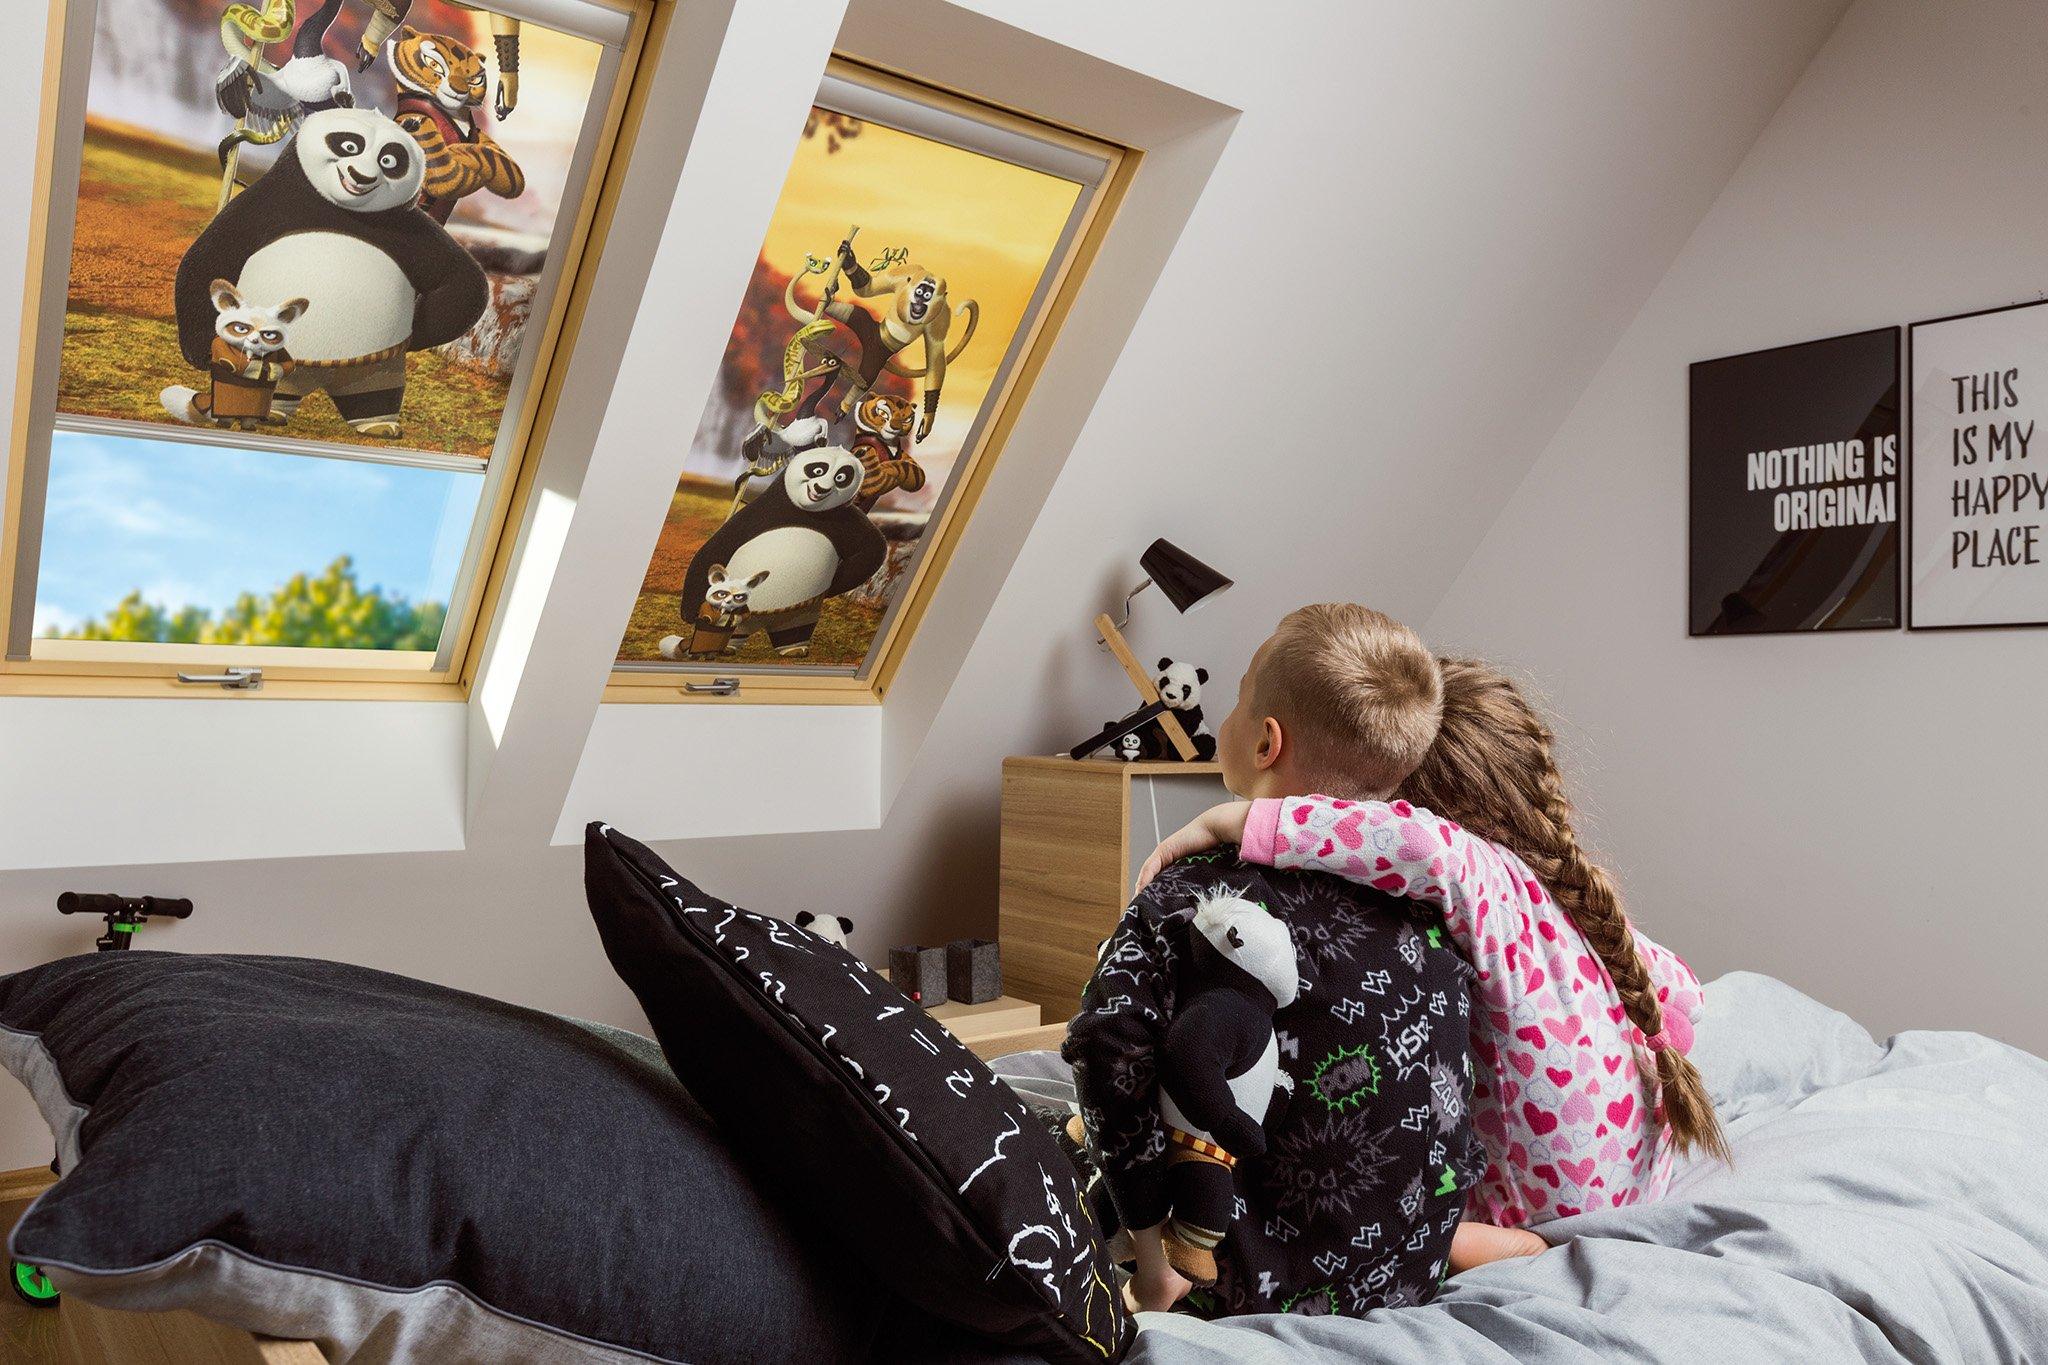 Rulouri opace FAKRO ARF Colectia DreamWorks